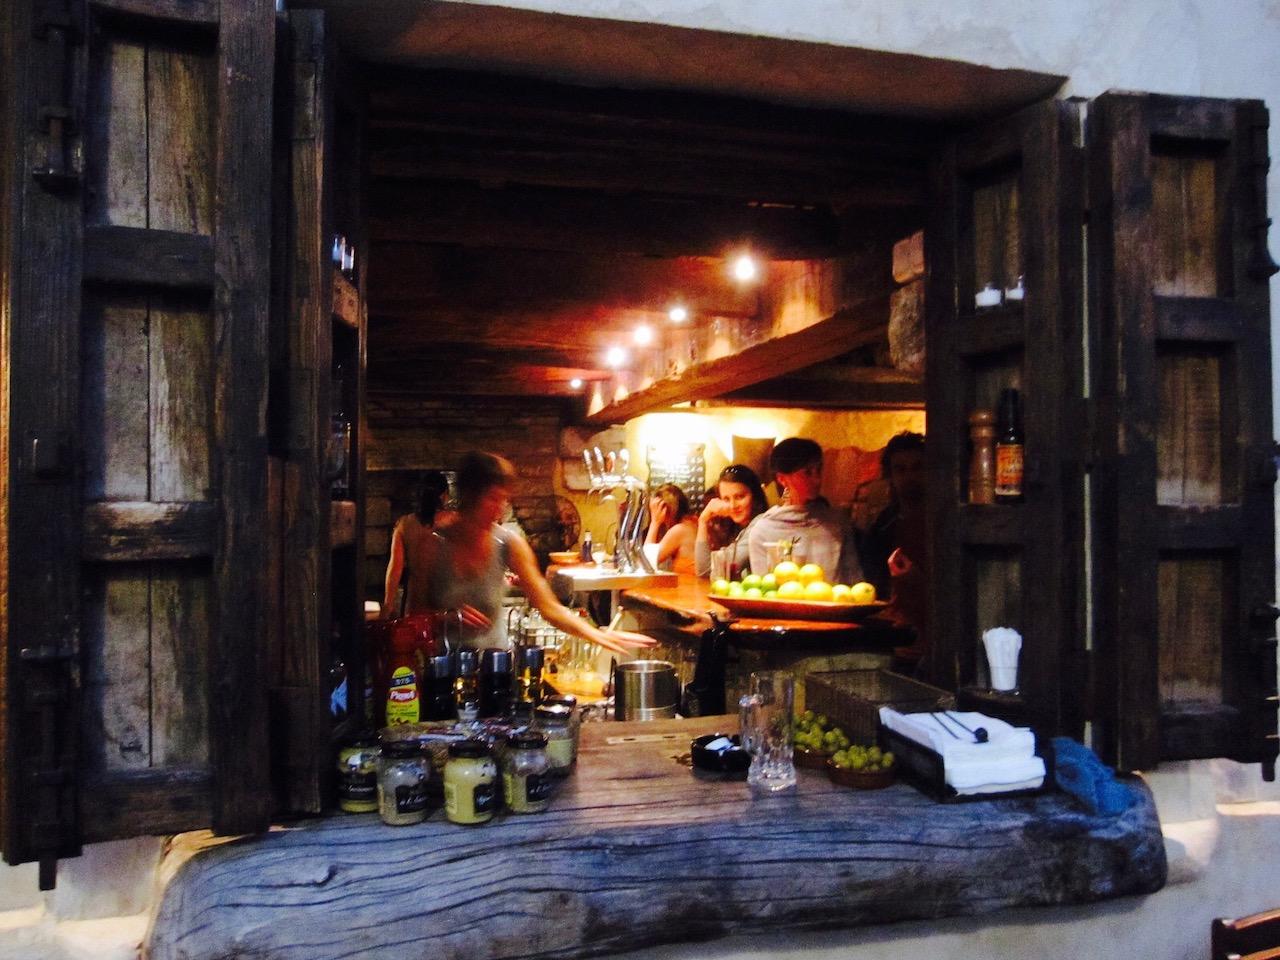 Blick aufs La Vaca Loca Restaurant, Tarifa, Andalusien